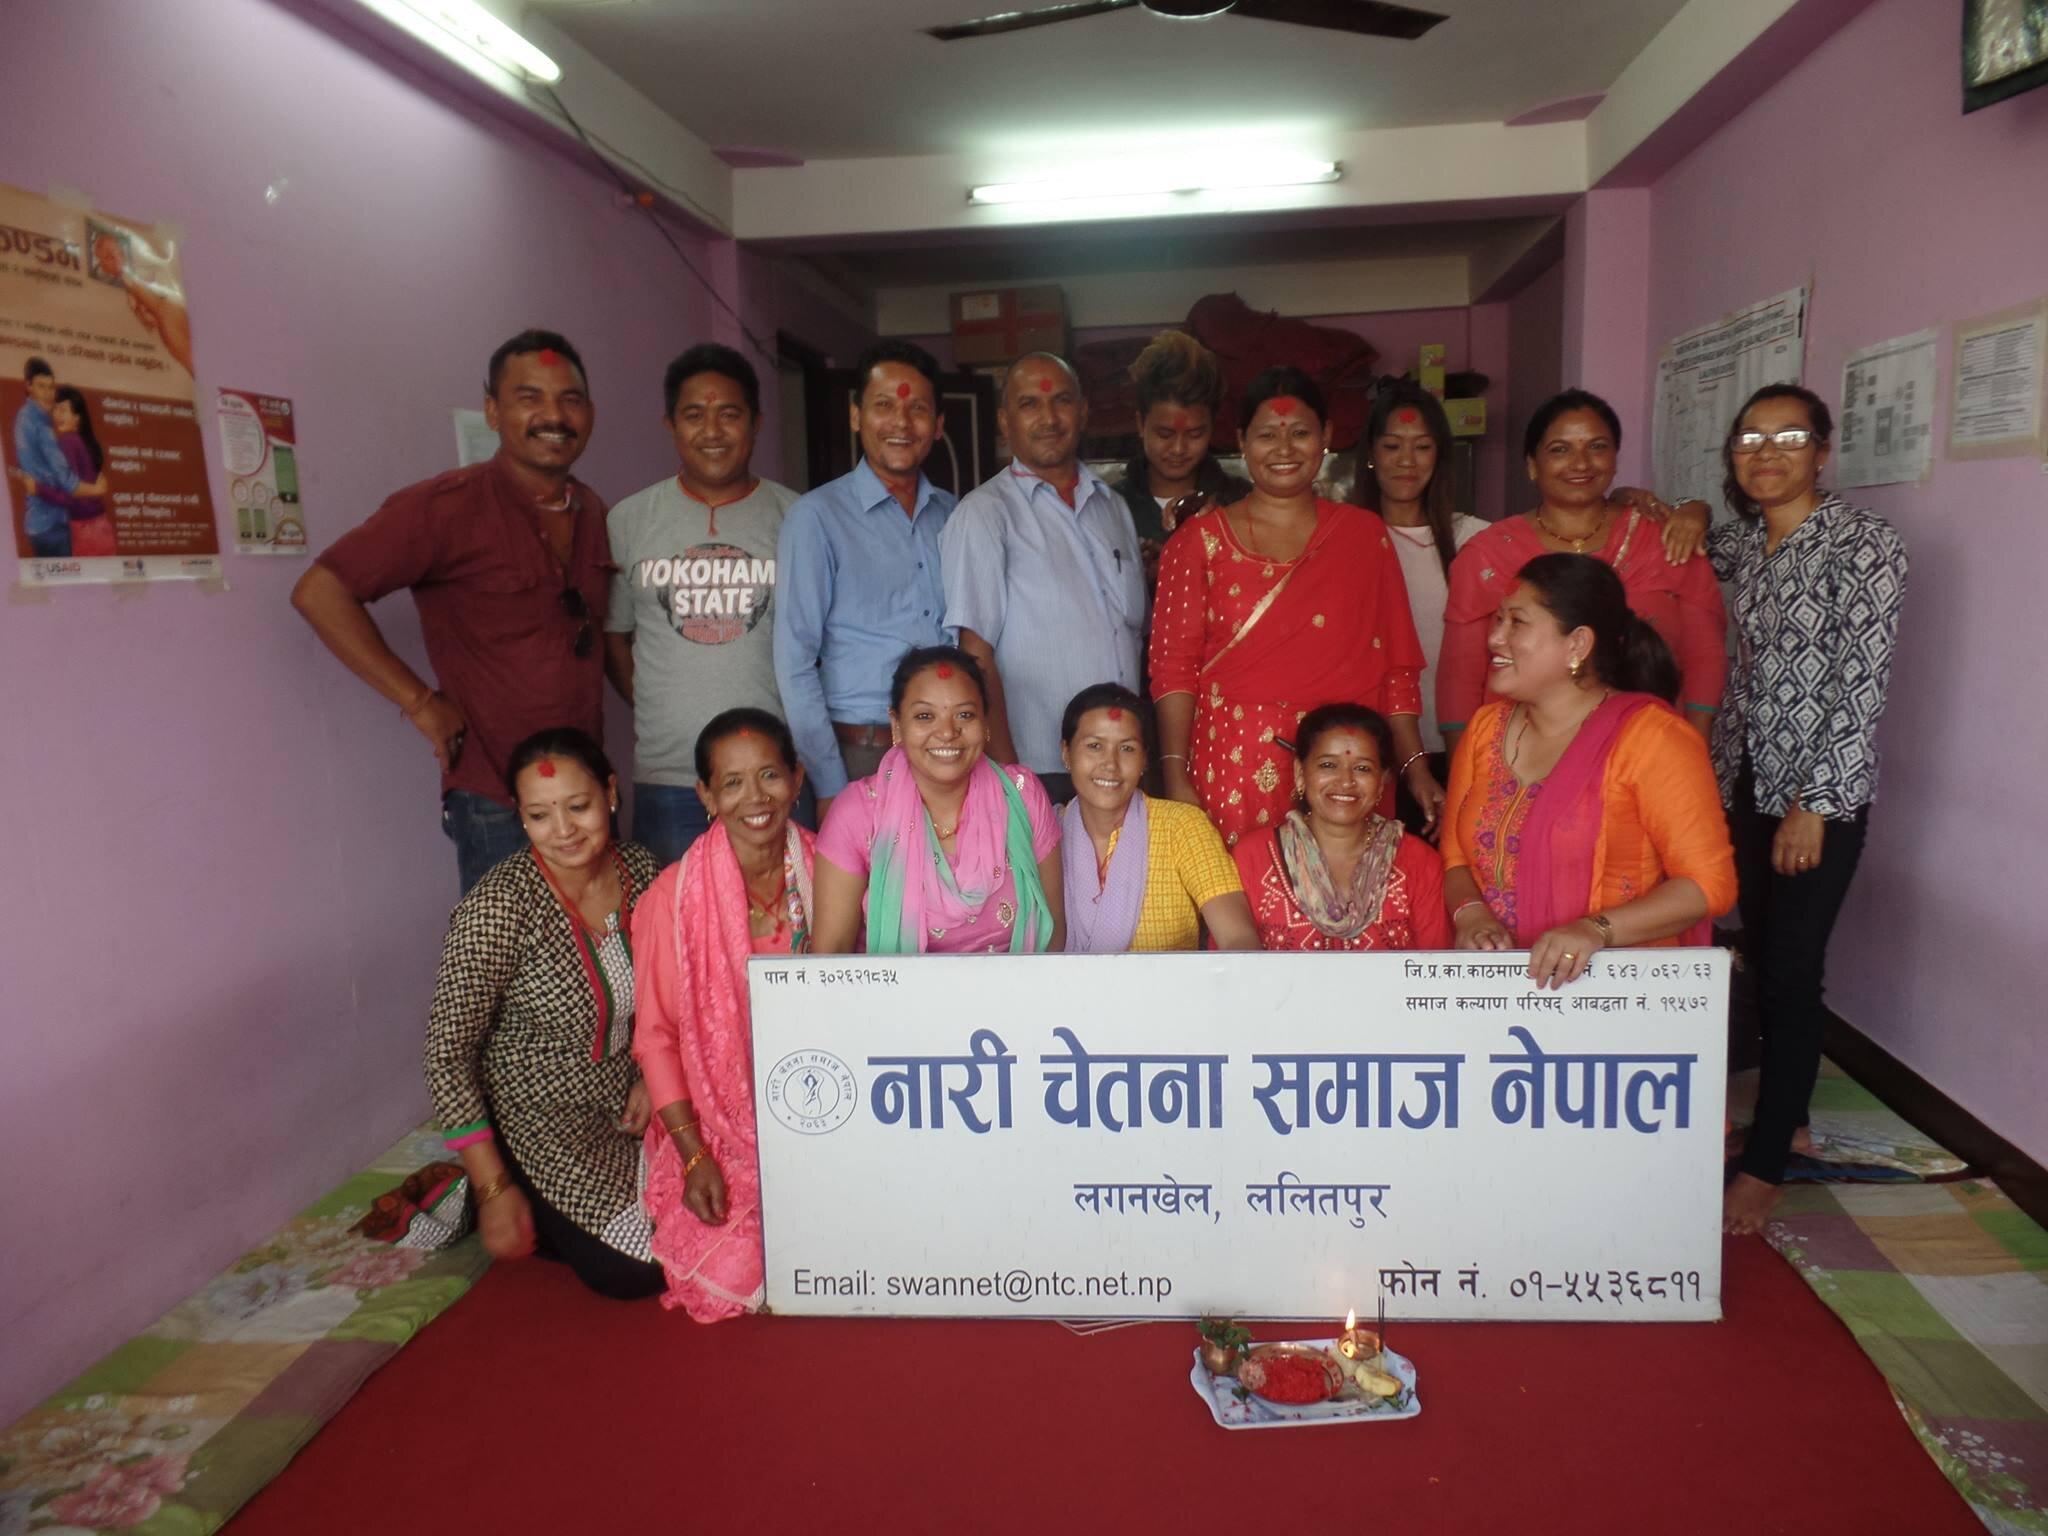 Society for Women Awareness (SWAN) - Nari Chetana Samaj, Nepal -